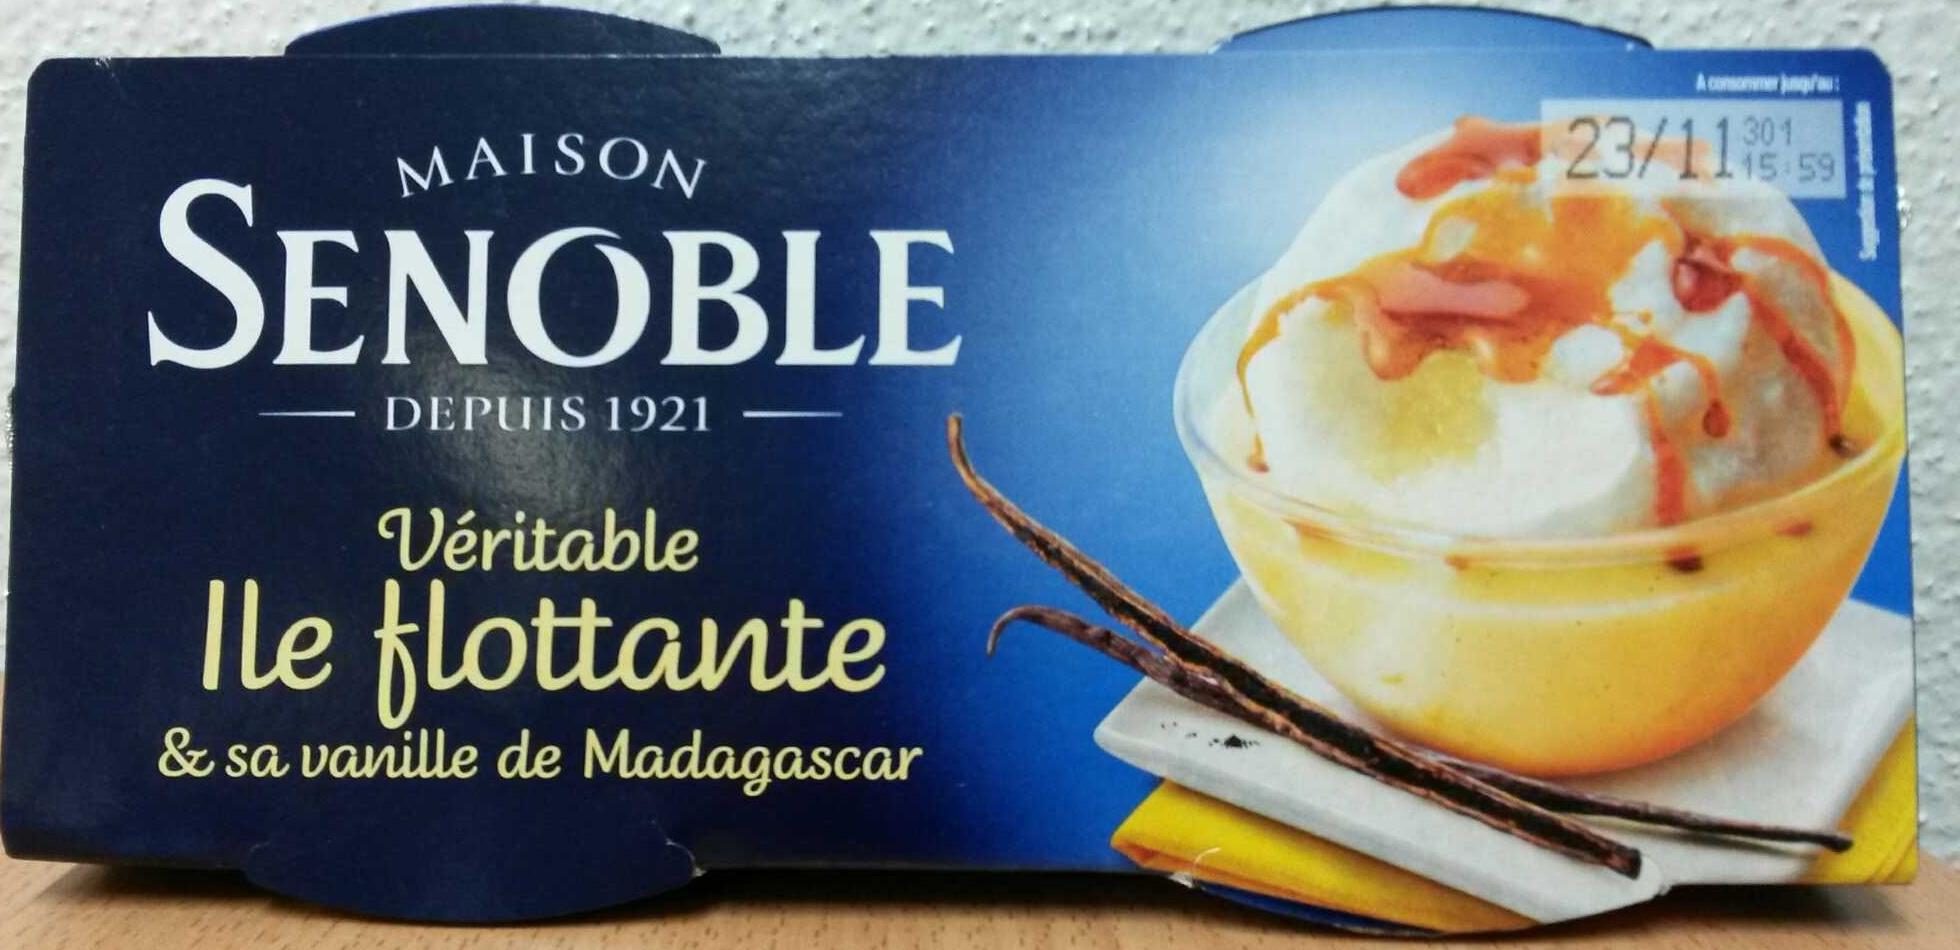 Véritable Ile flottante & sa vanille de Madagascar - Produit - fr